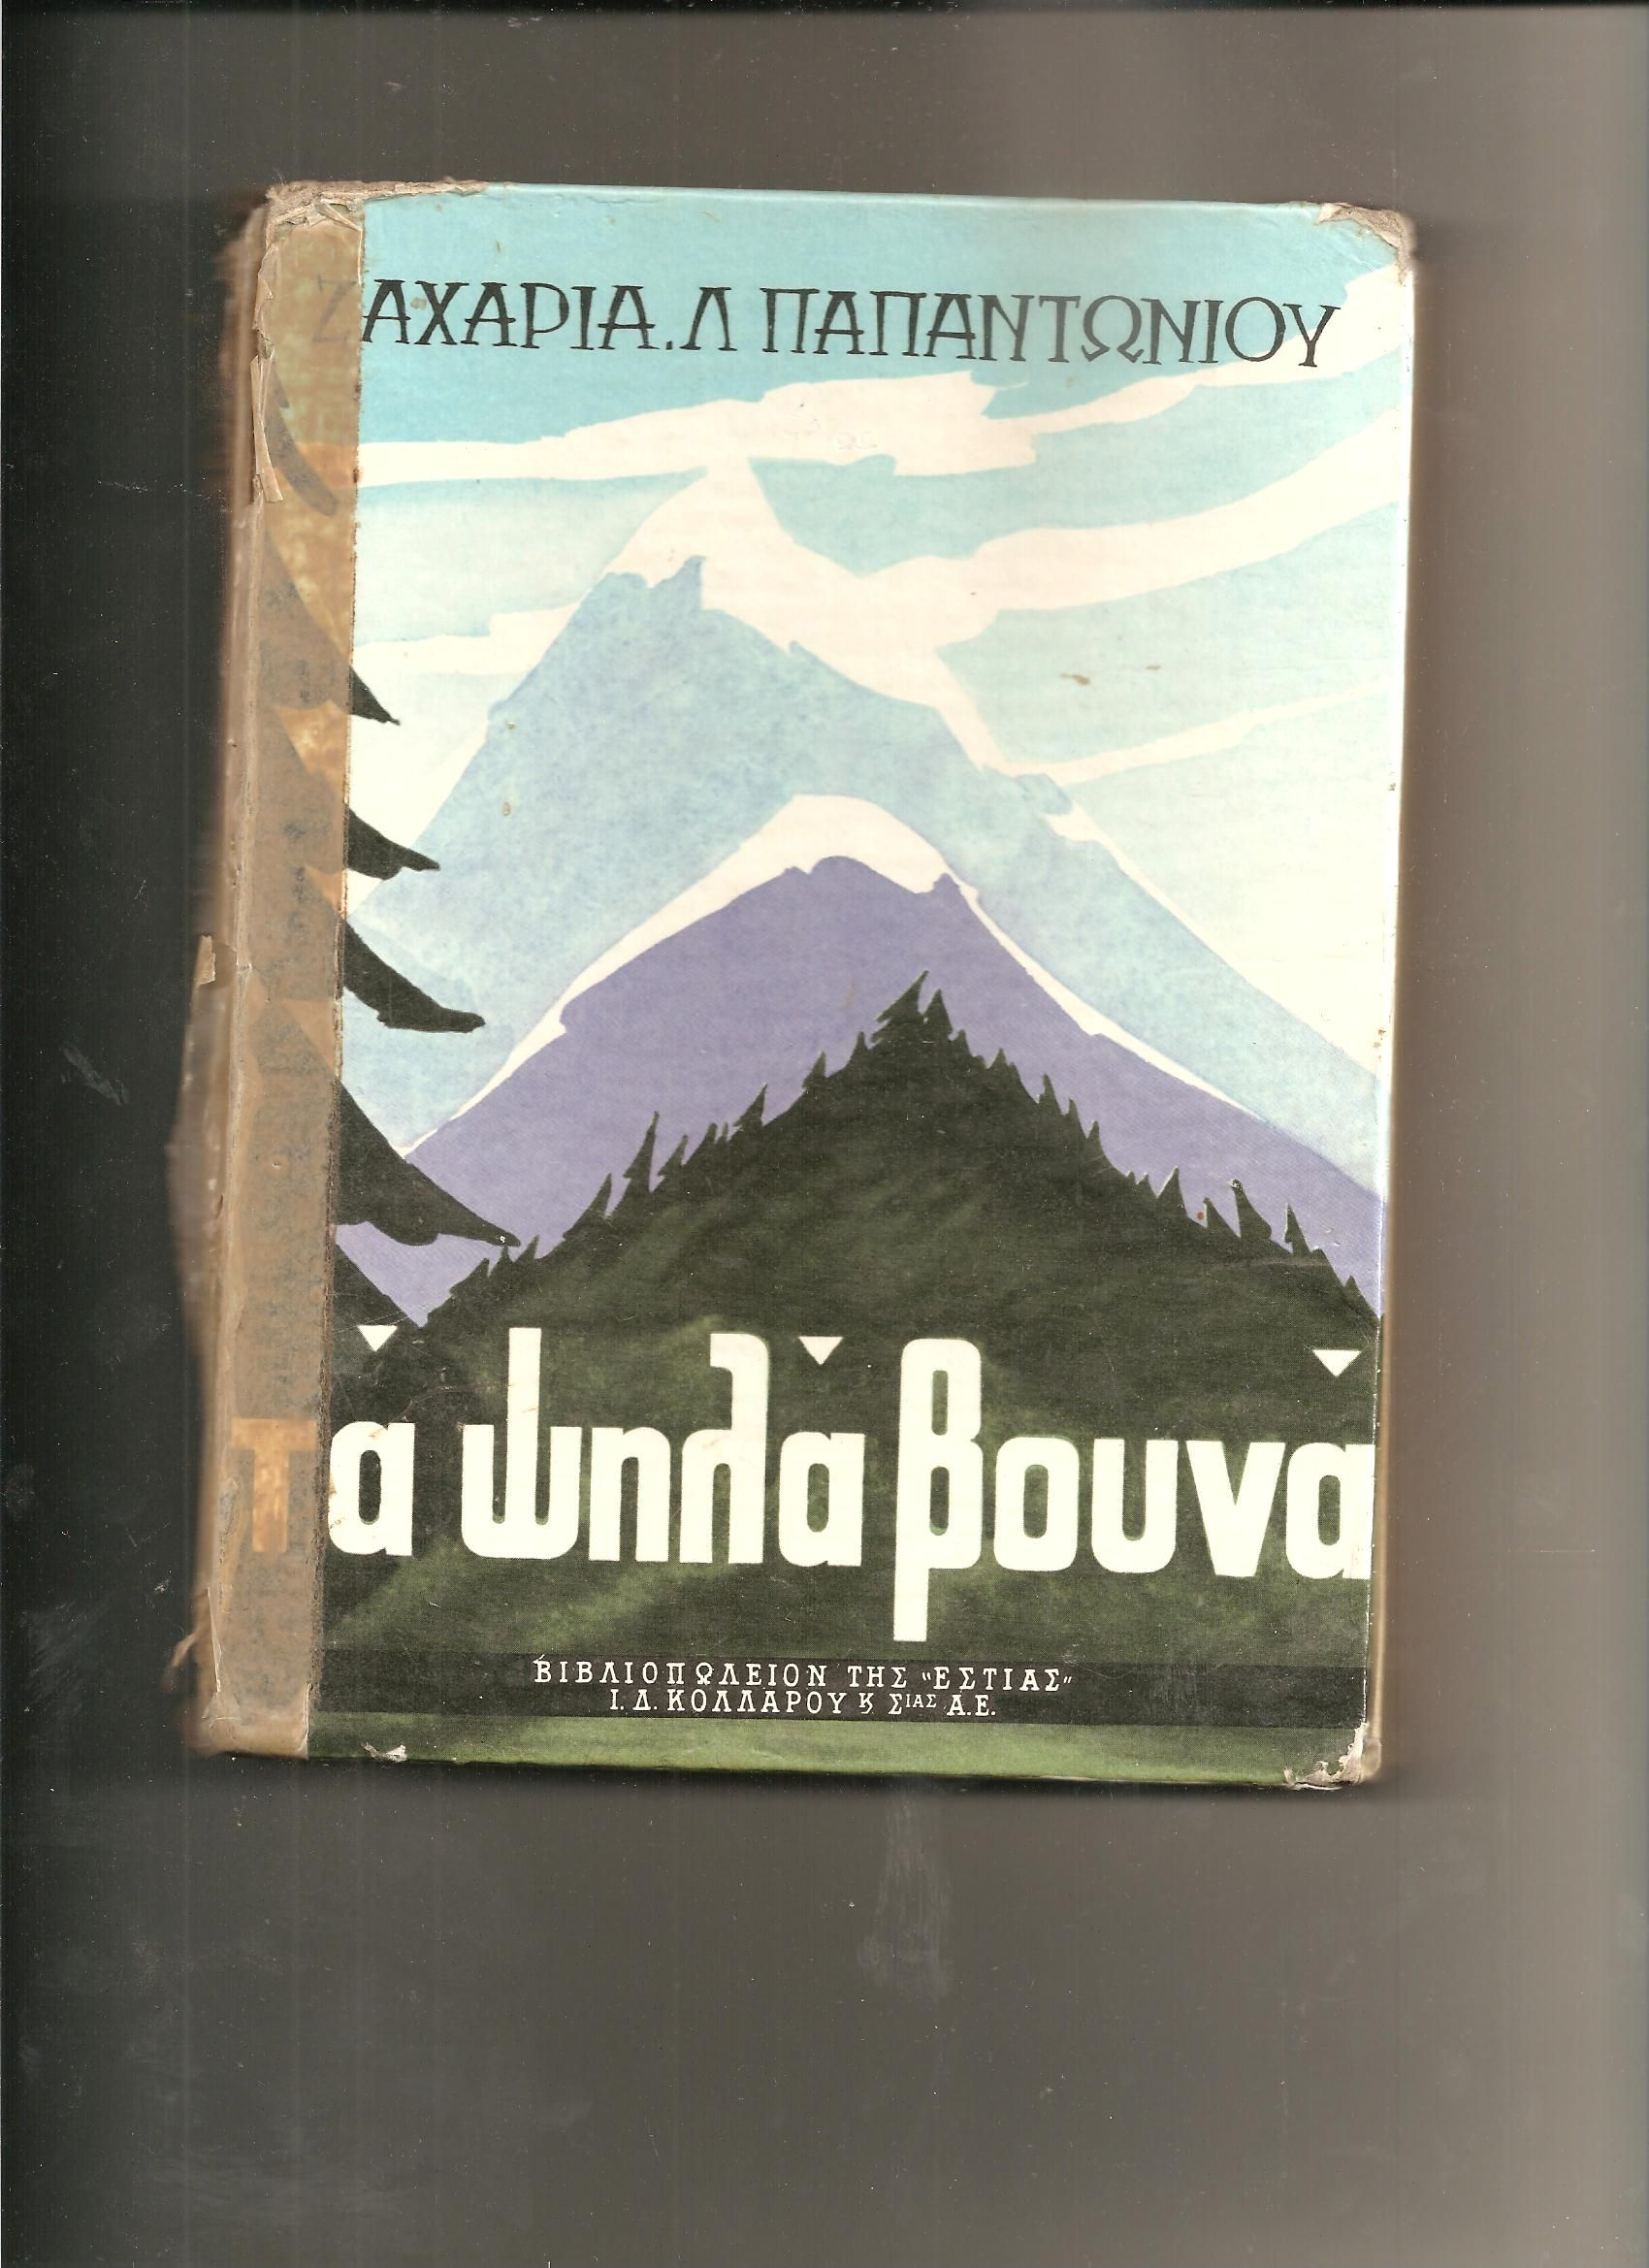 7781672adb6 τα ψηλά βουνά του Ζαχαρία Λ.Παπαντωνίου... greek book